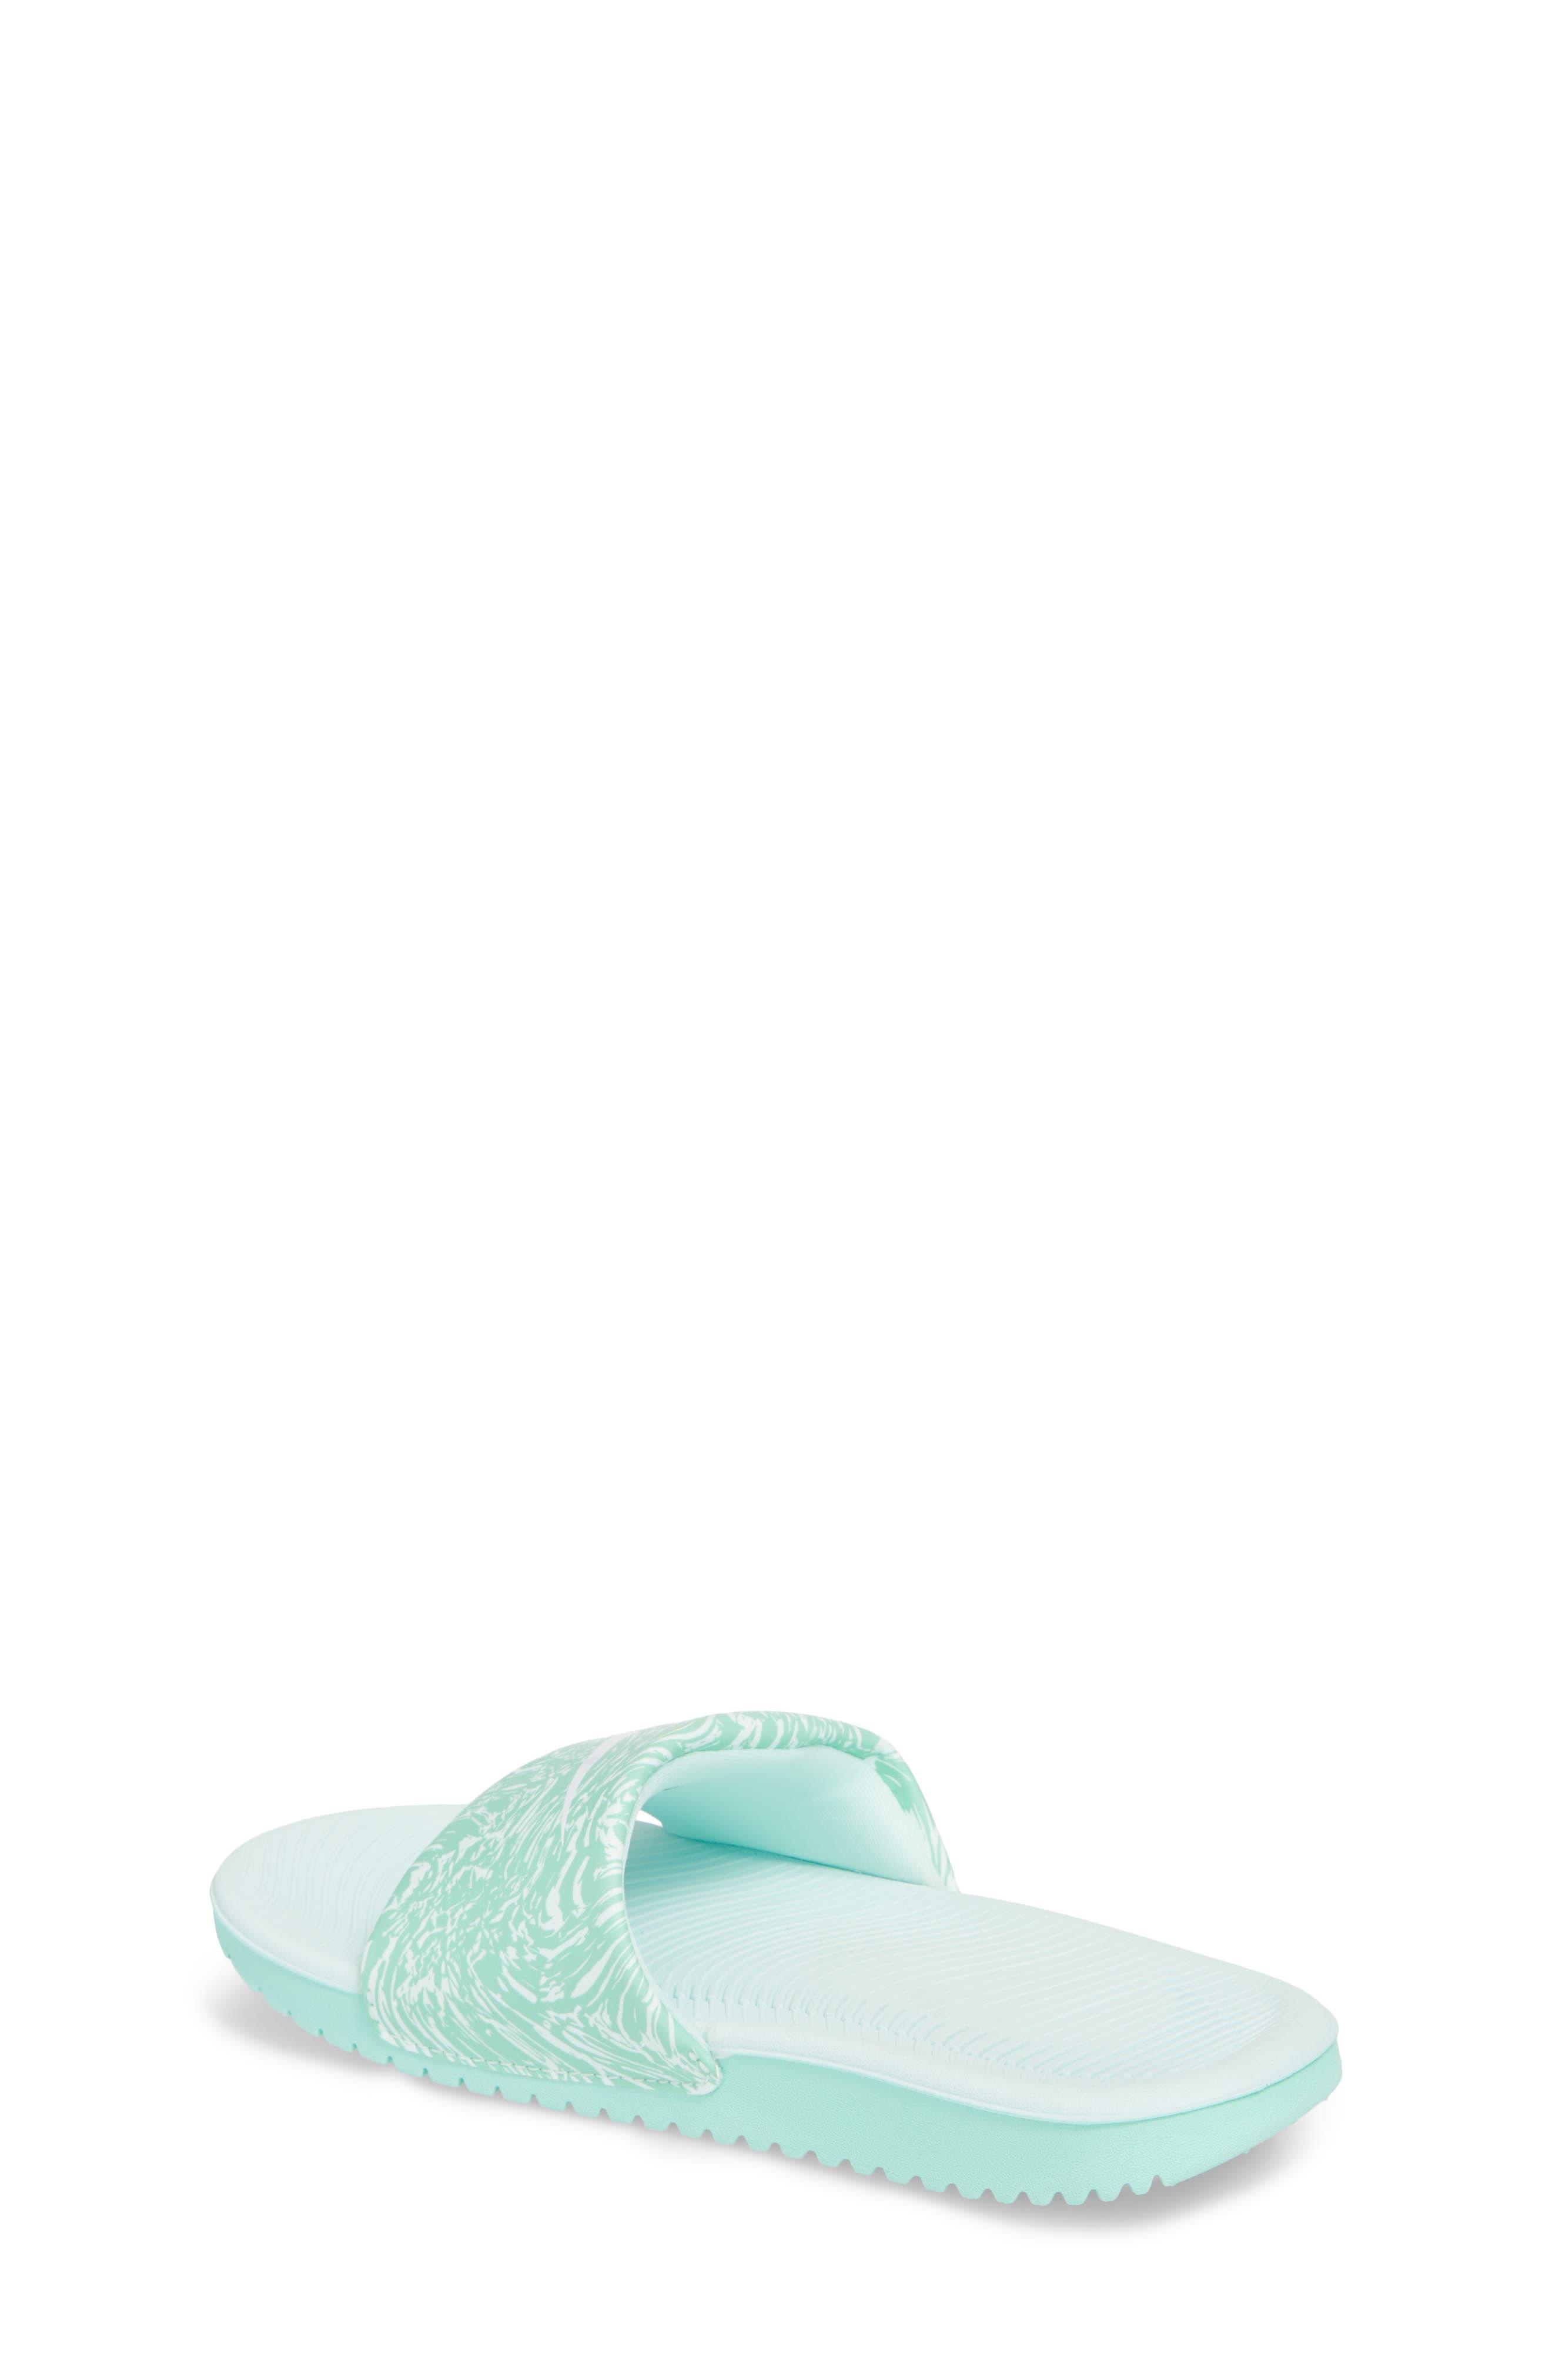 'Kawa' Print Slide Sandal,                             Alternate thumbnail 2, color,                             Emerald Rise/ White/ Igloo